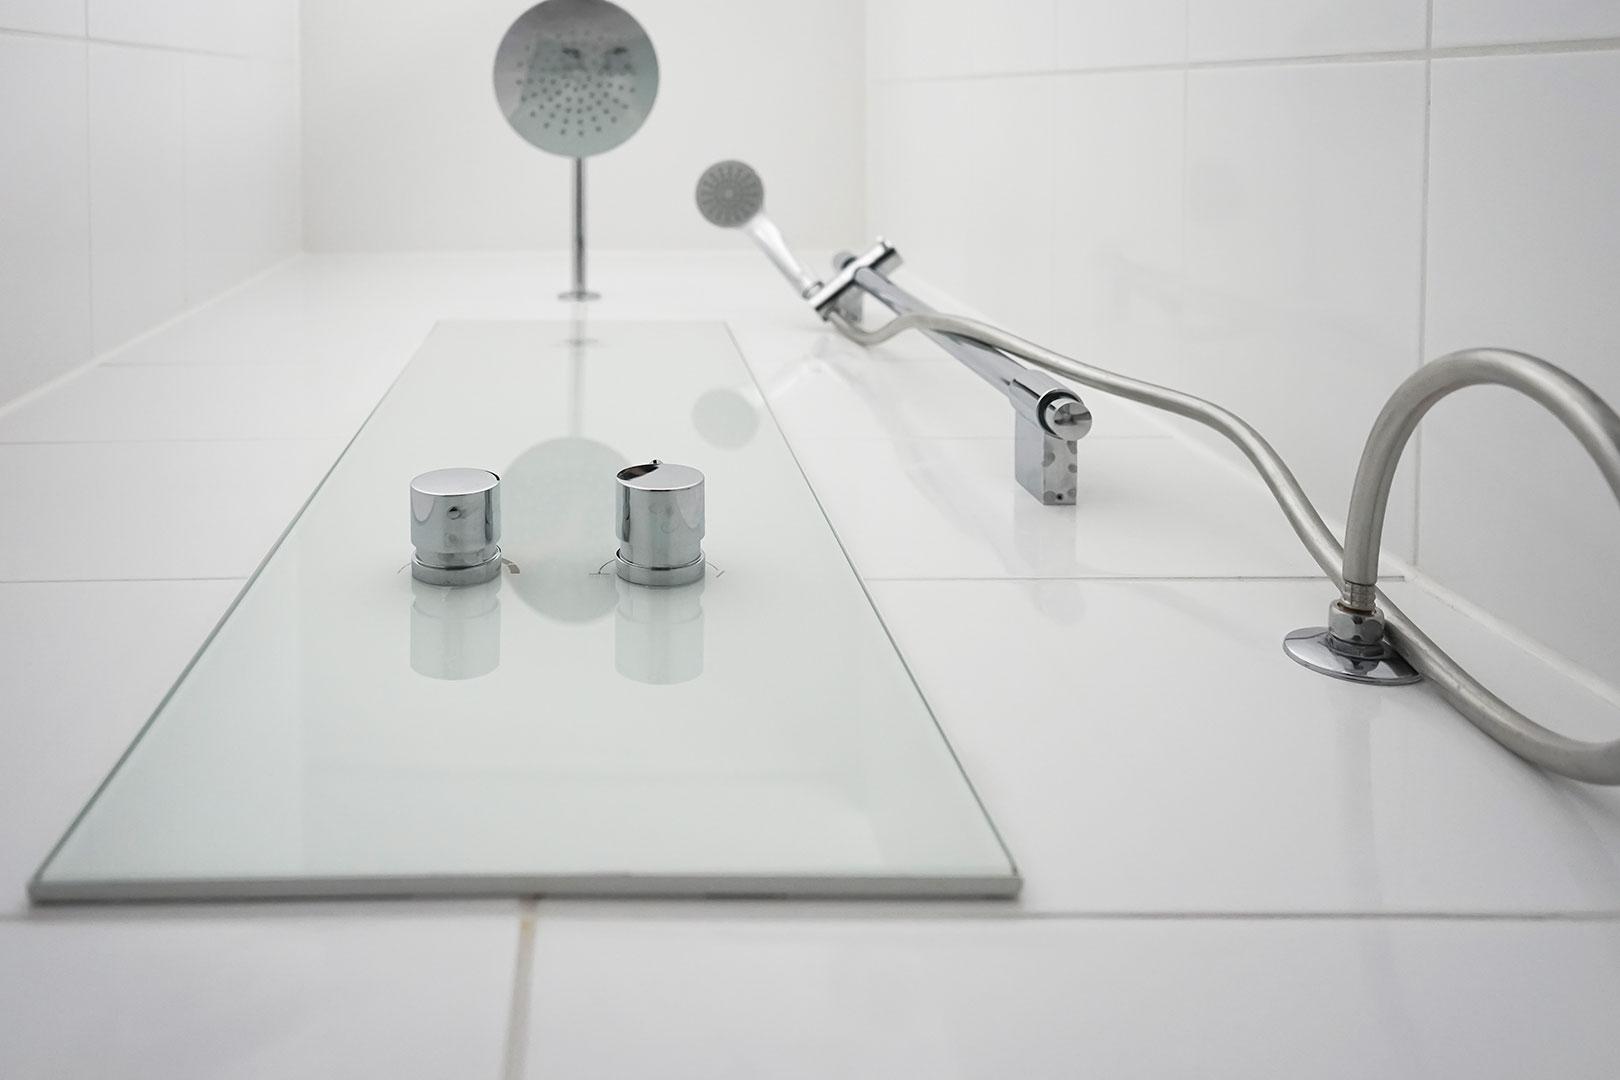 showersave--blue-2